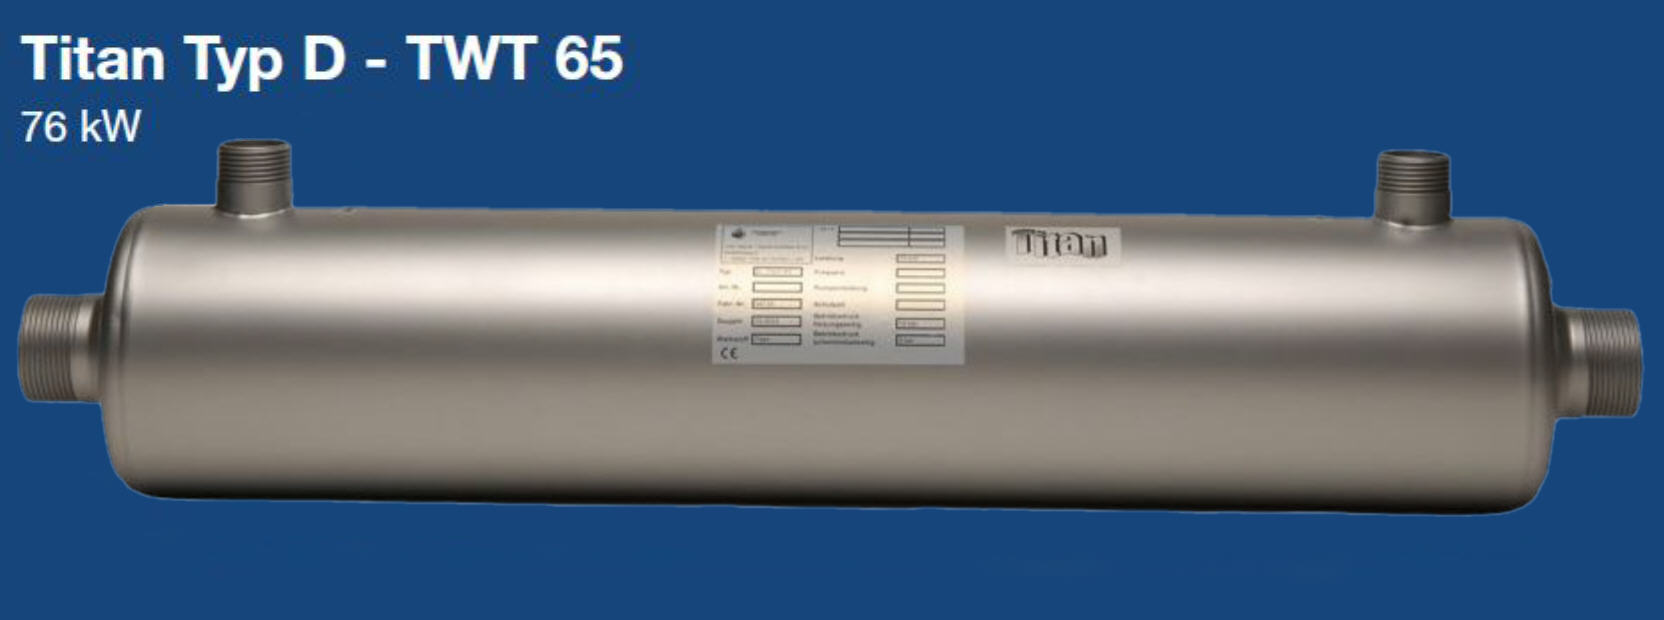 Daprà Titan Heizungs-Wärme-Tauscher D-TWT 65 kW Killus-Technik.de